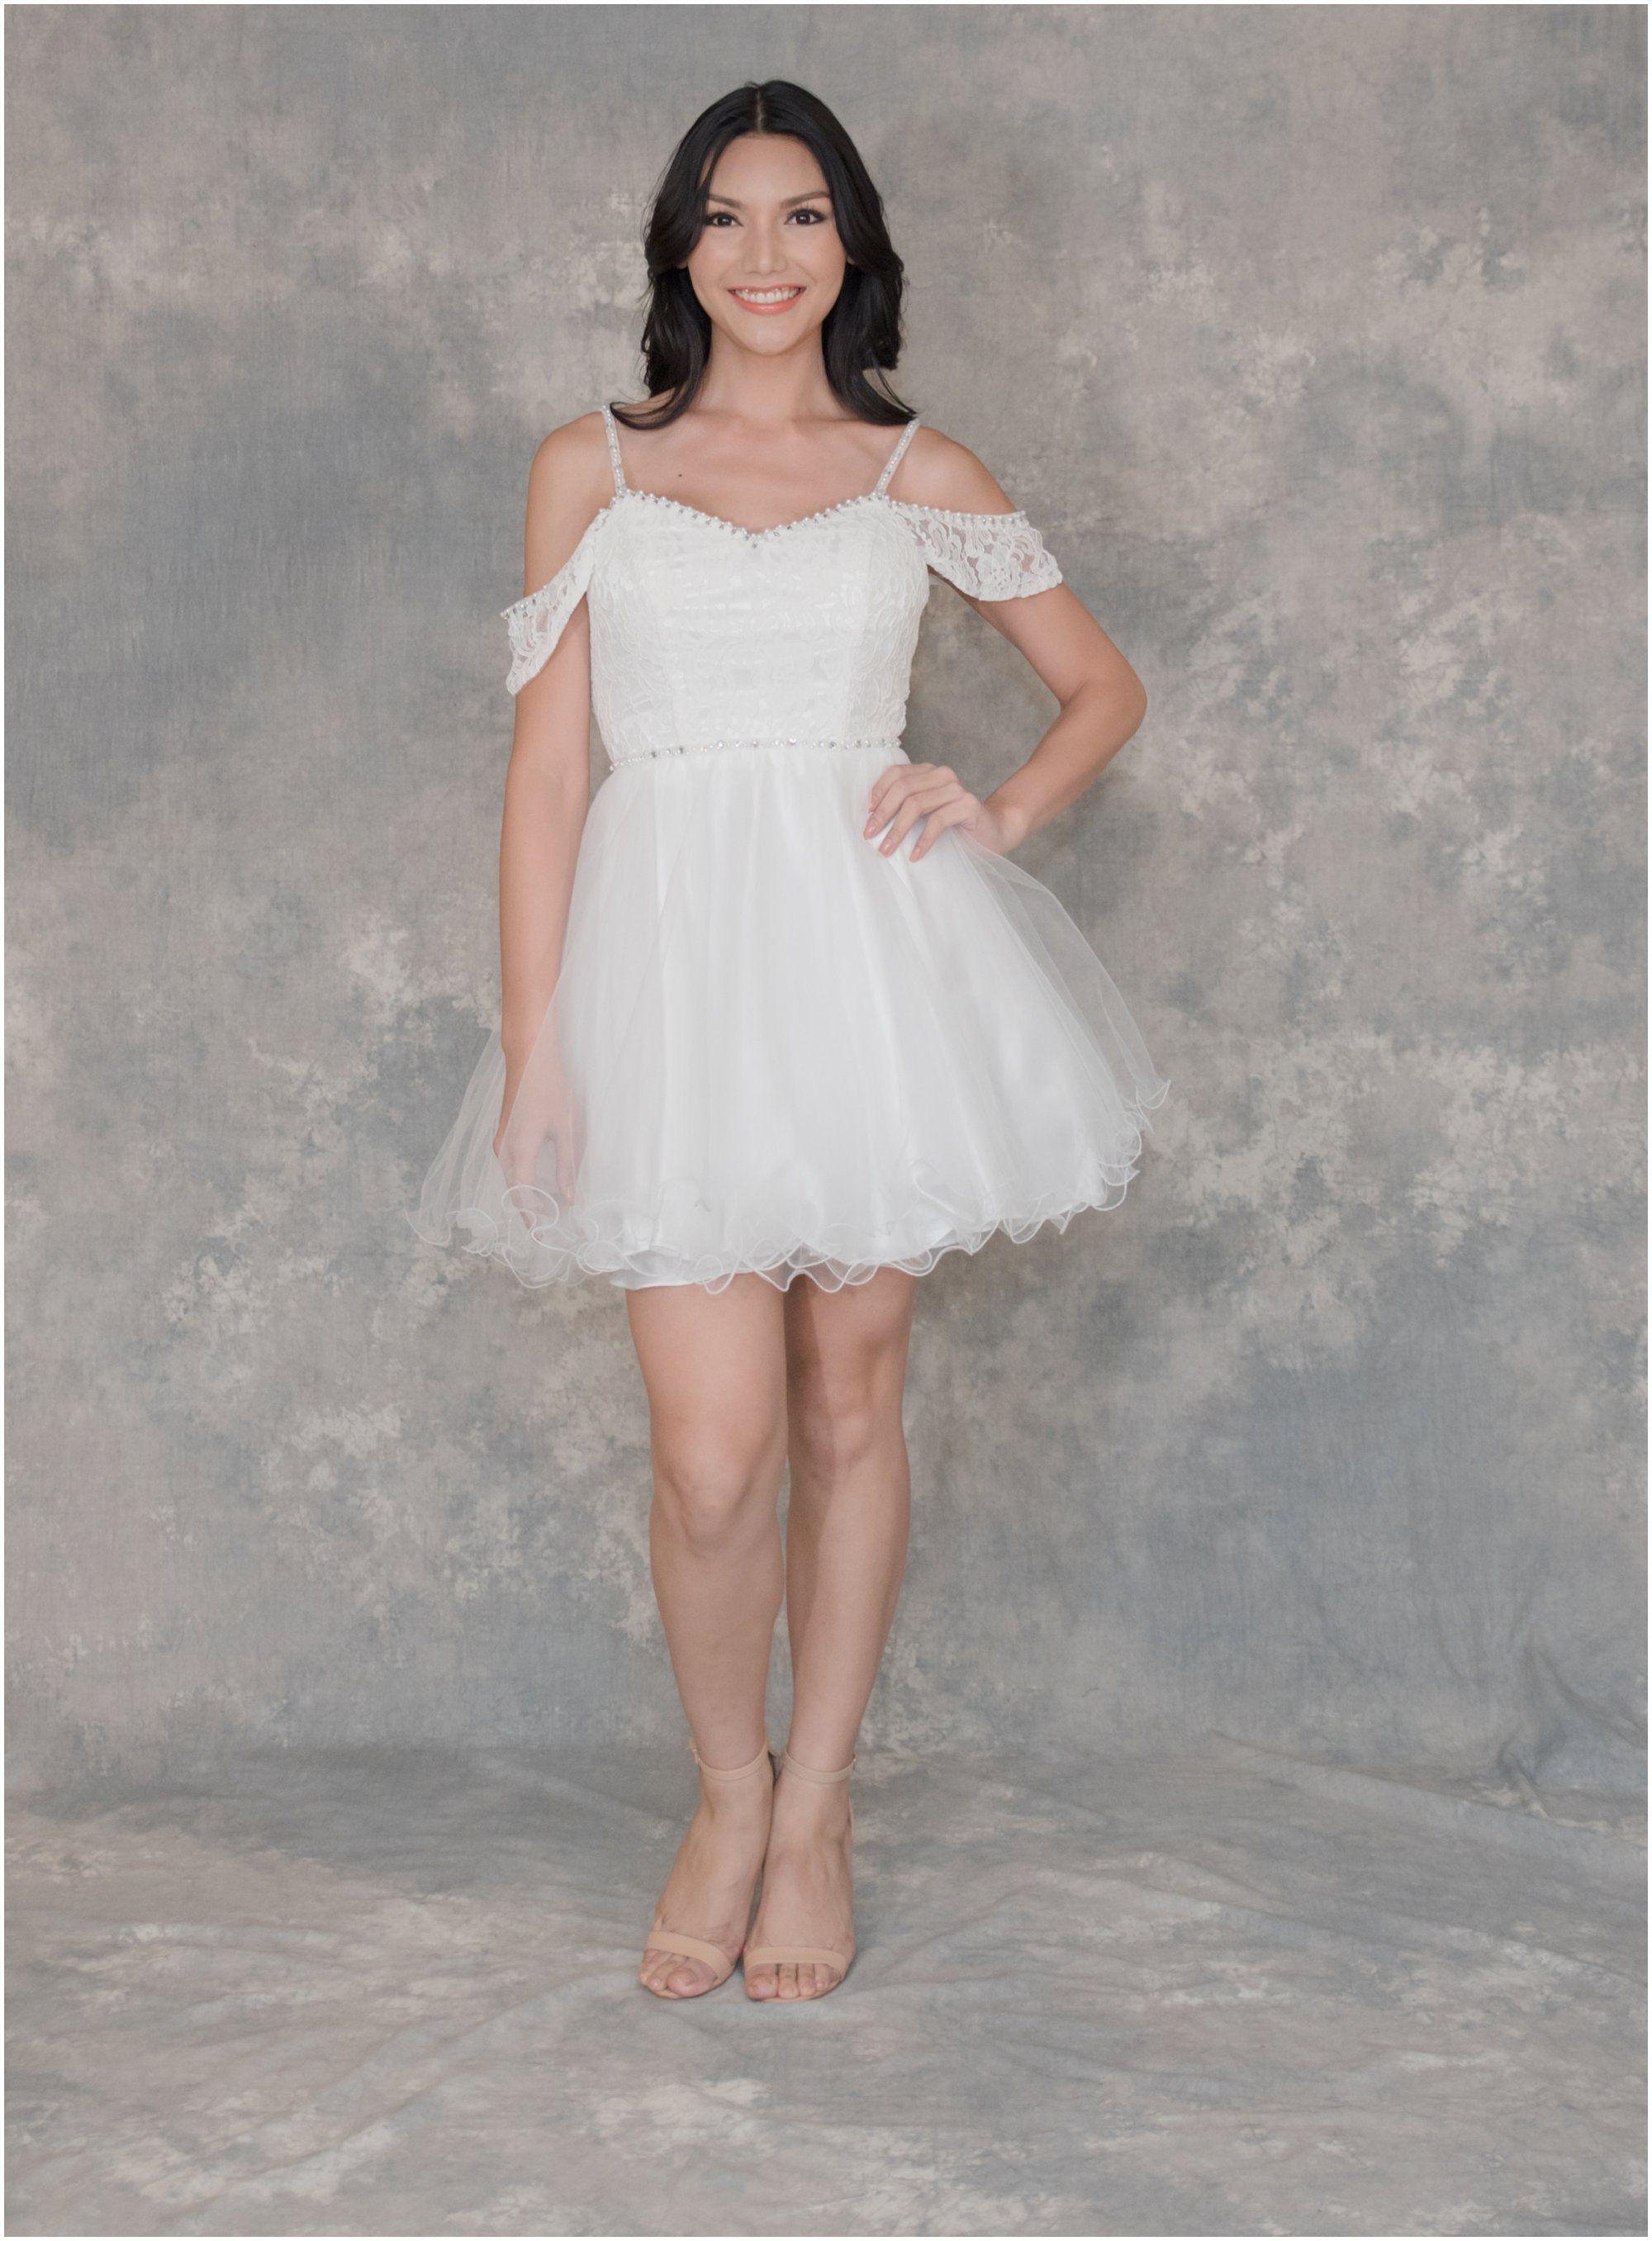 Rent A Dress Las Vegas Rent A Dress Formal Dress Military Ball Dress Ideas Prom Dre Wedding Dresses Unique Casual Wedding Dress Short Wedding Dress [ 2713 x 2000 Pixel ]